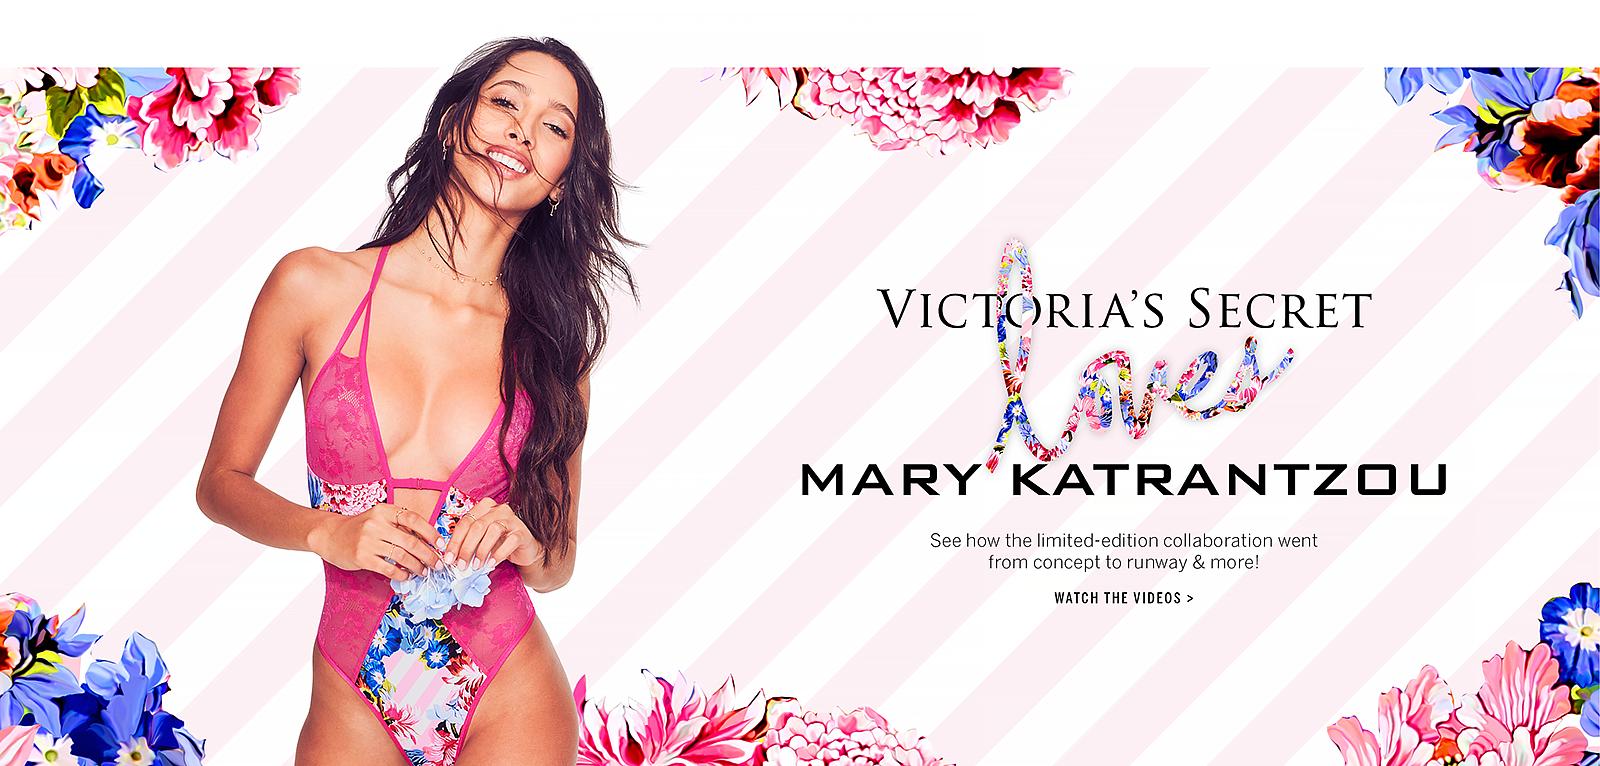 328b521031c28 2018 Victoria's Secret Fashion Show - Victoria's Secret